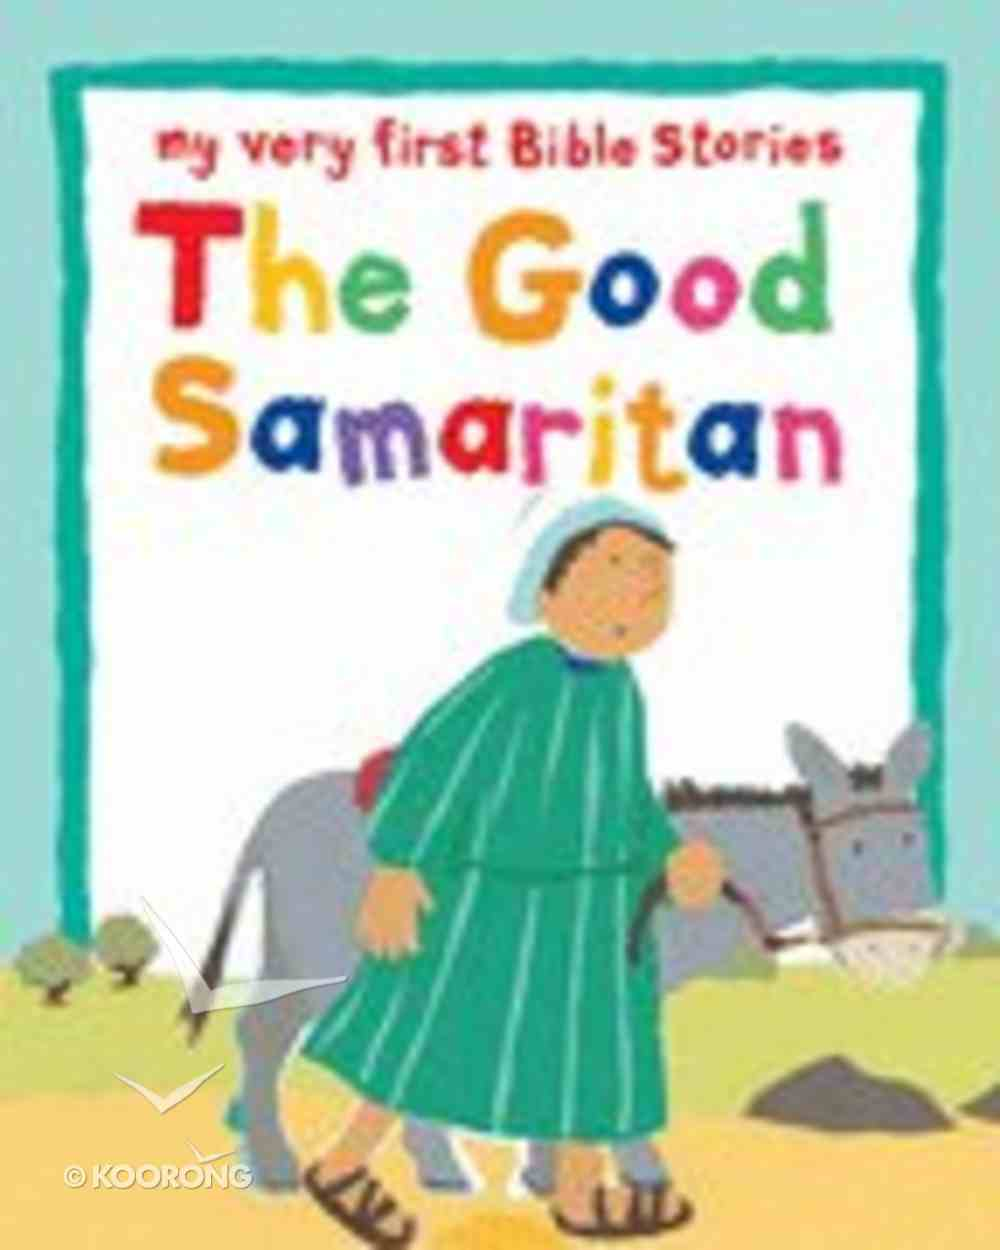 The Good Samaritan (My Very First Bible Stories Series) Board Book